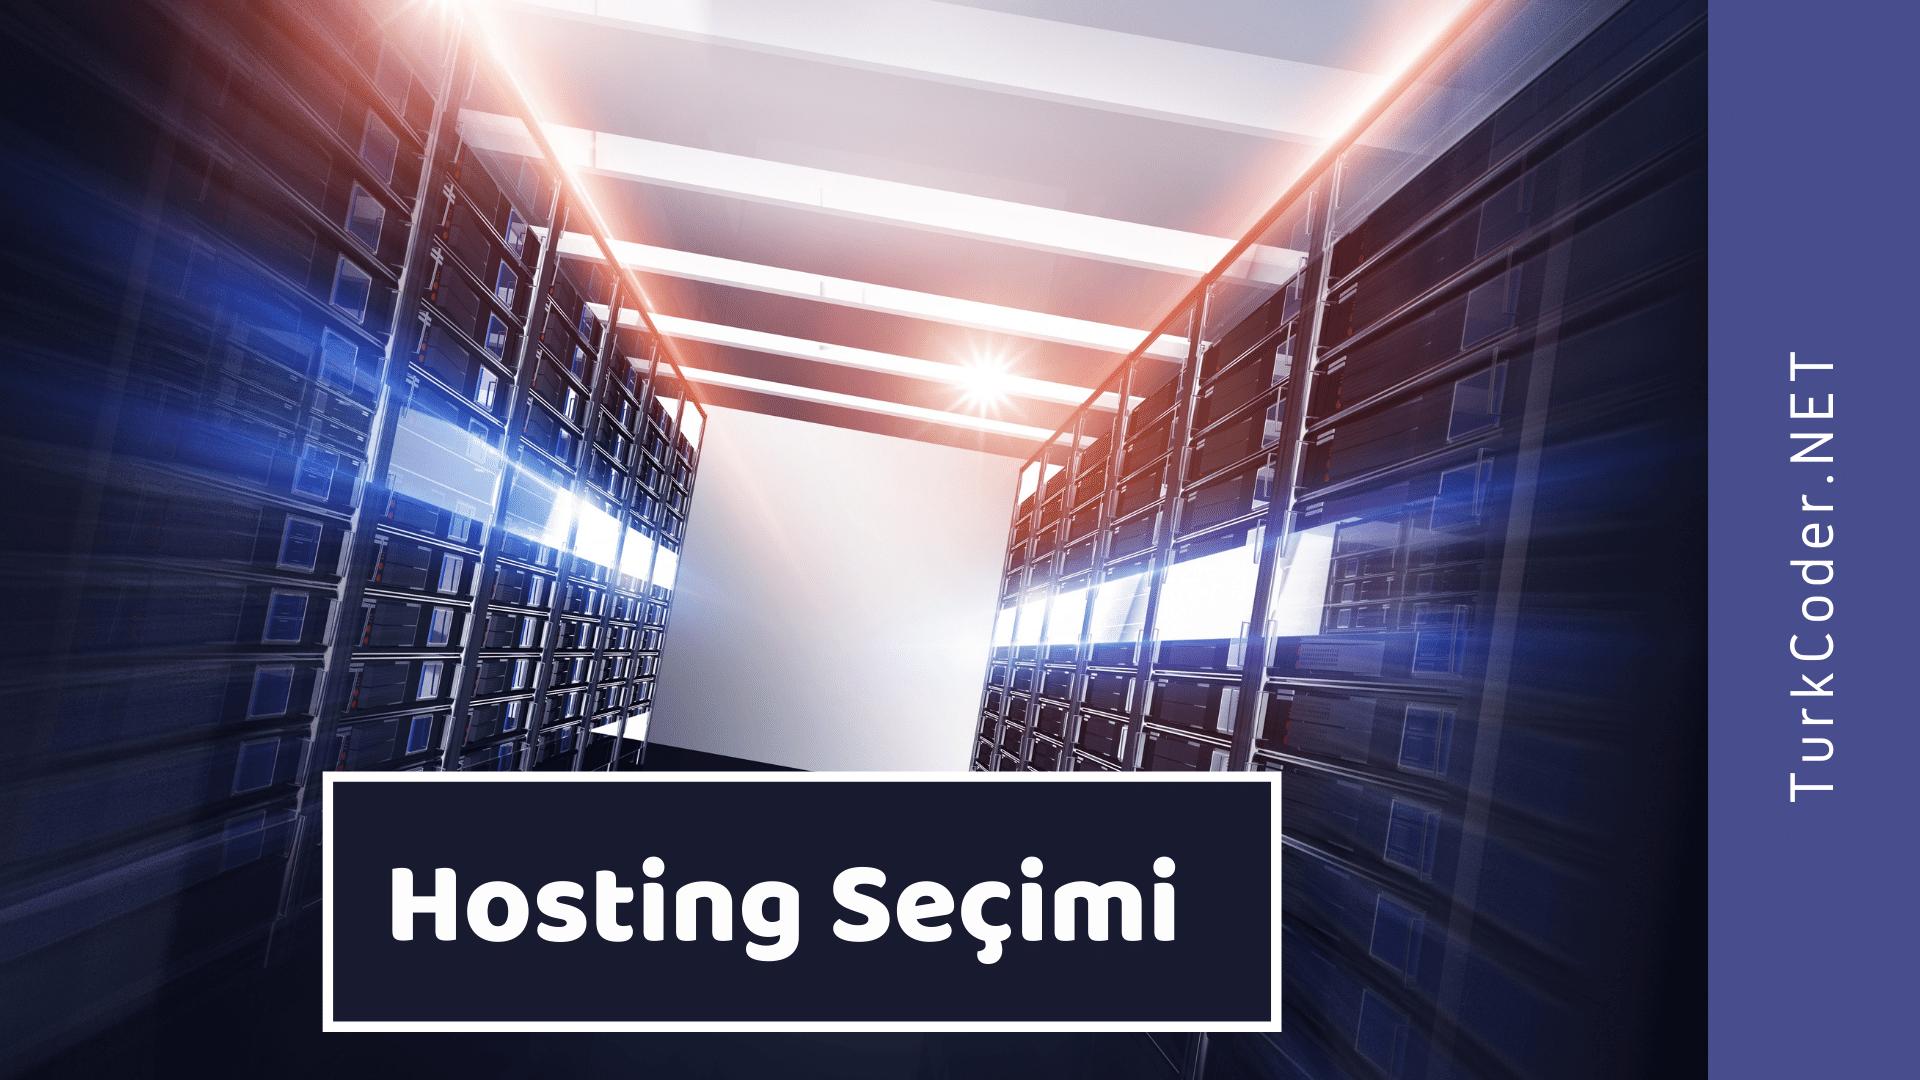 Hosting Secim